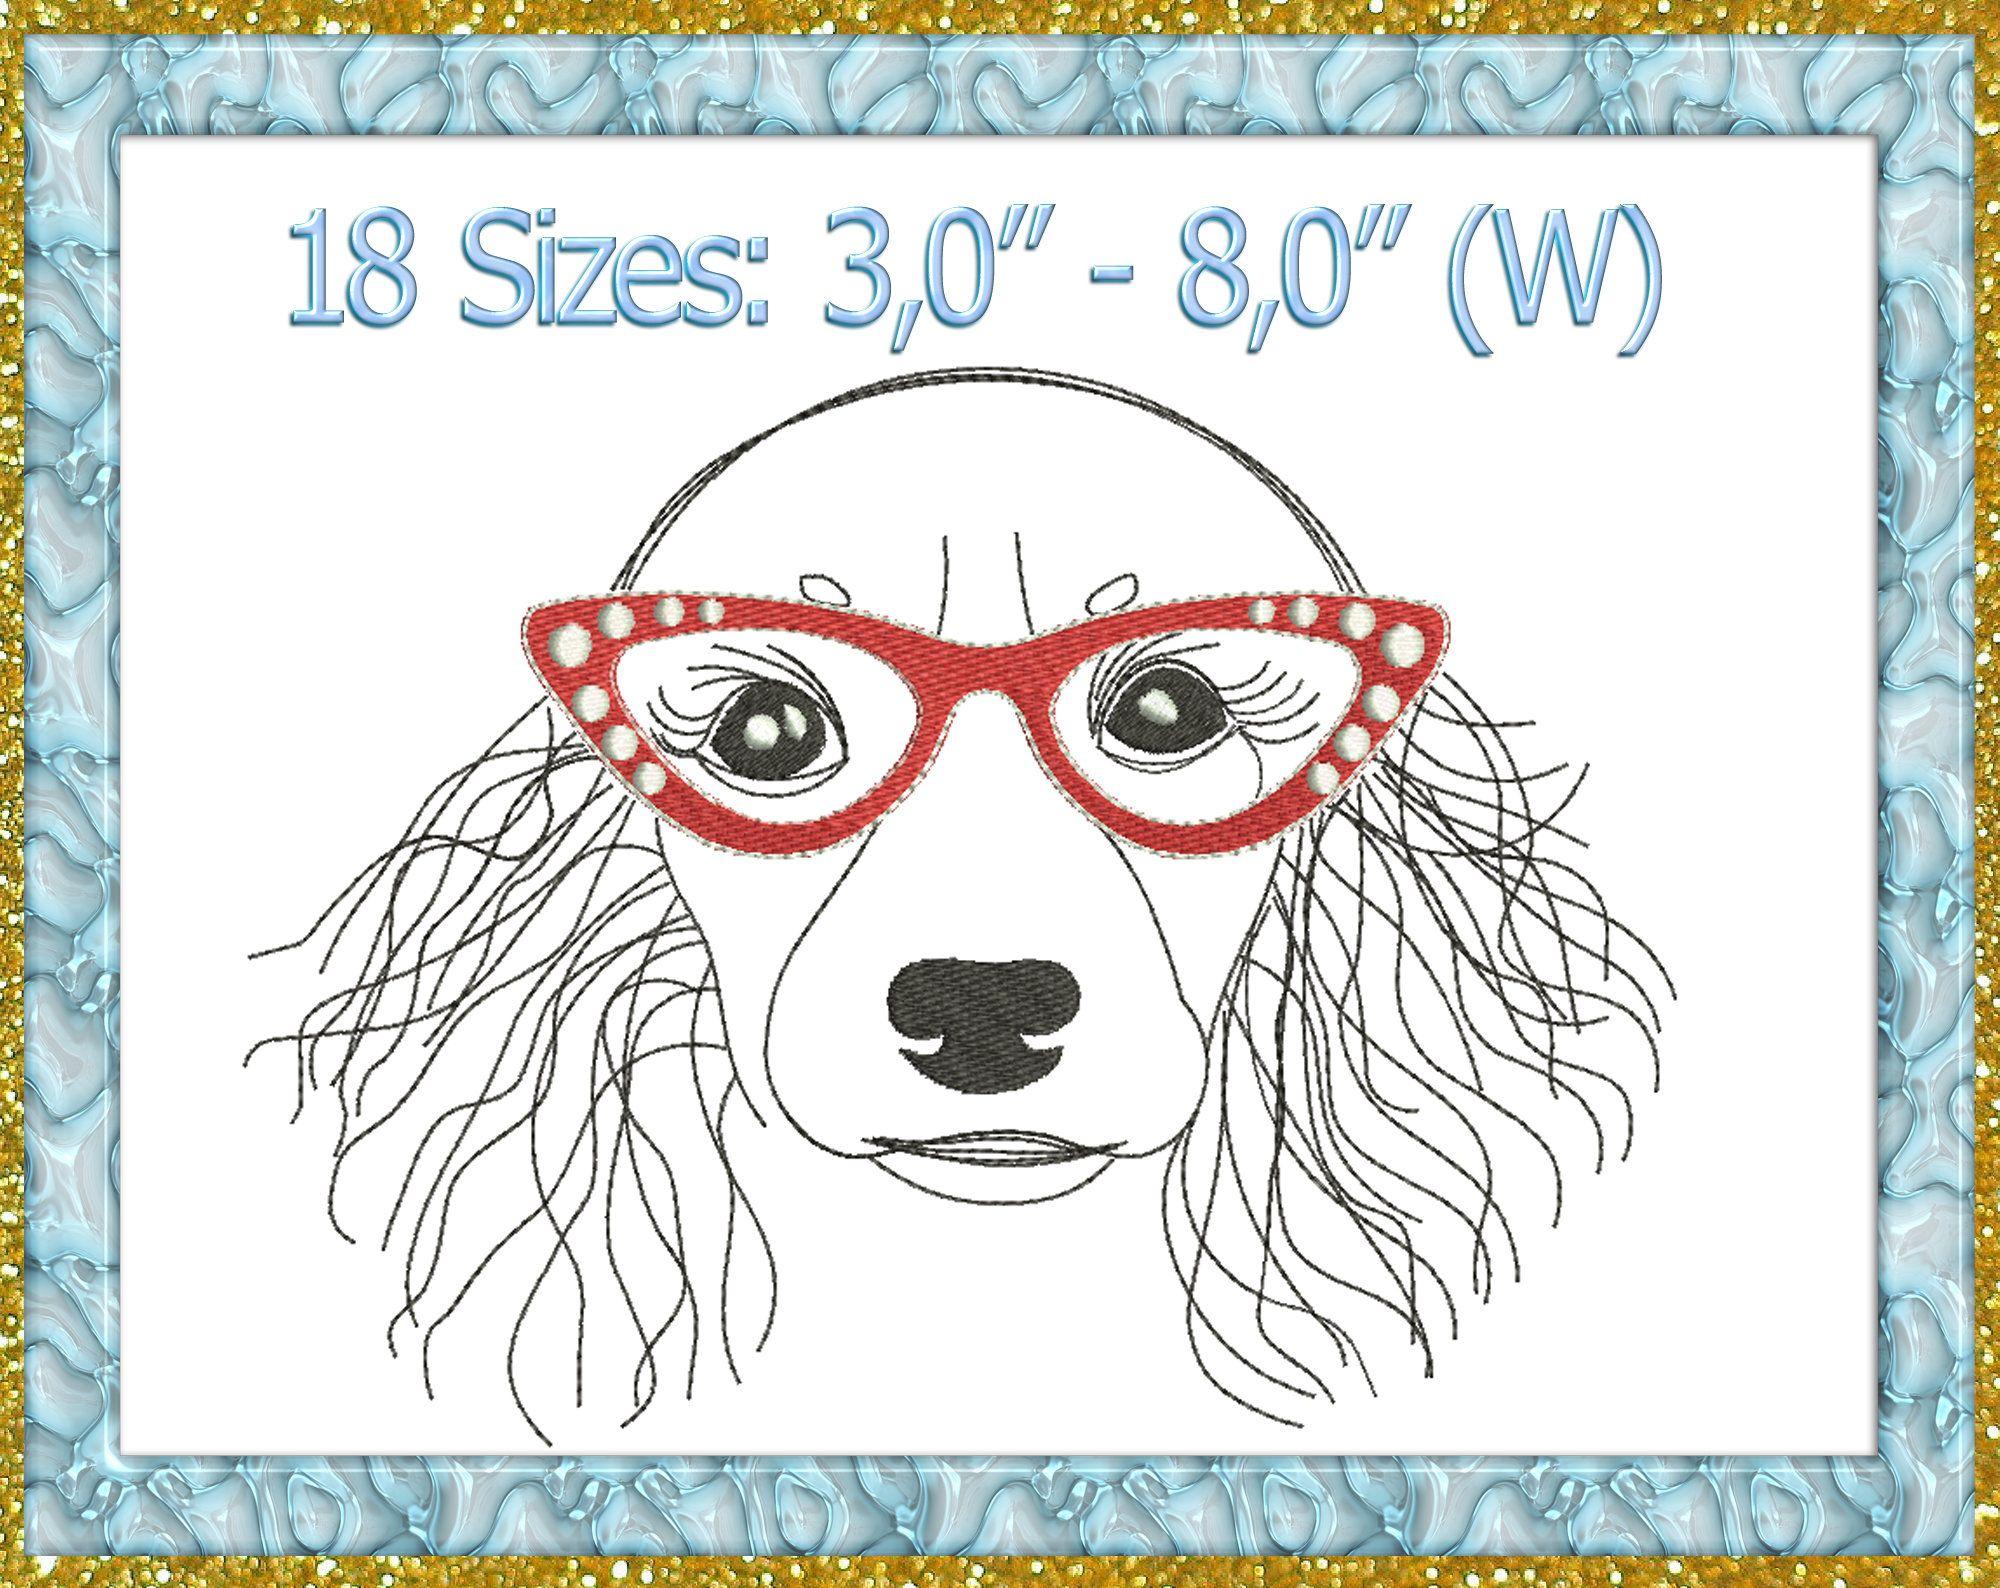 Dachshund Glasses Embroidery Design Longhair Dachshund Machine